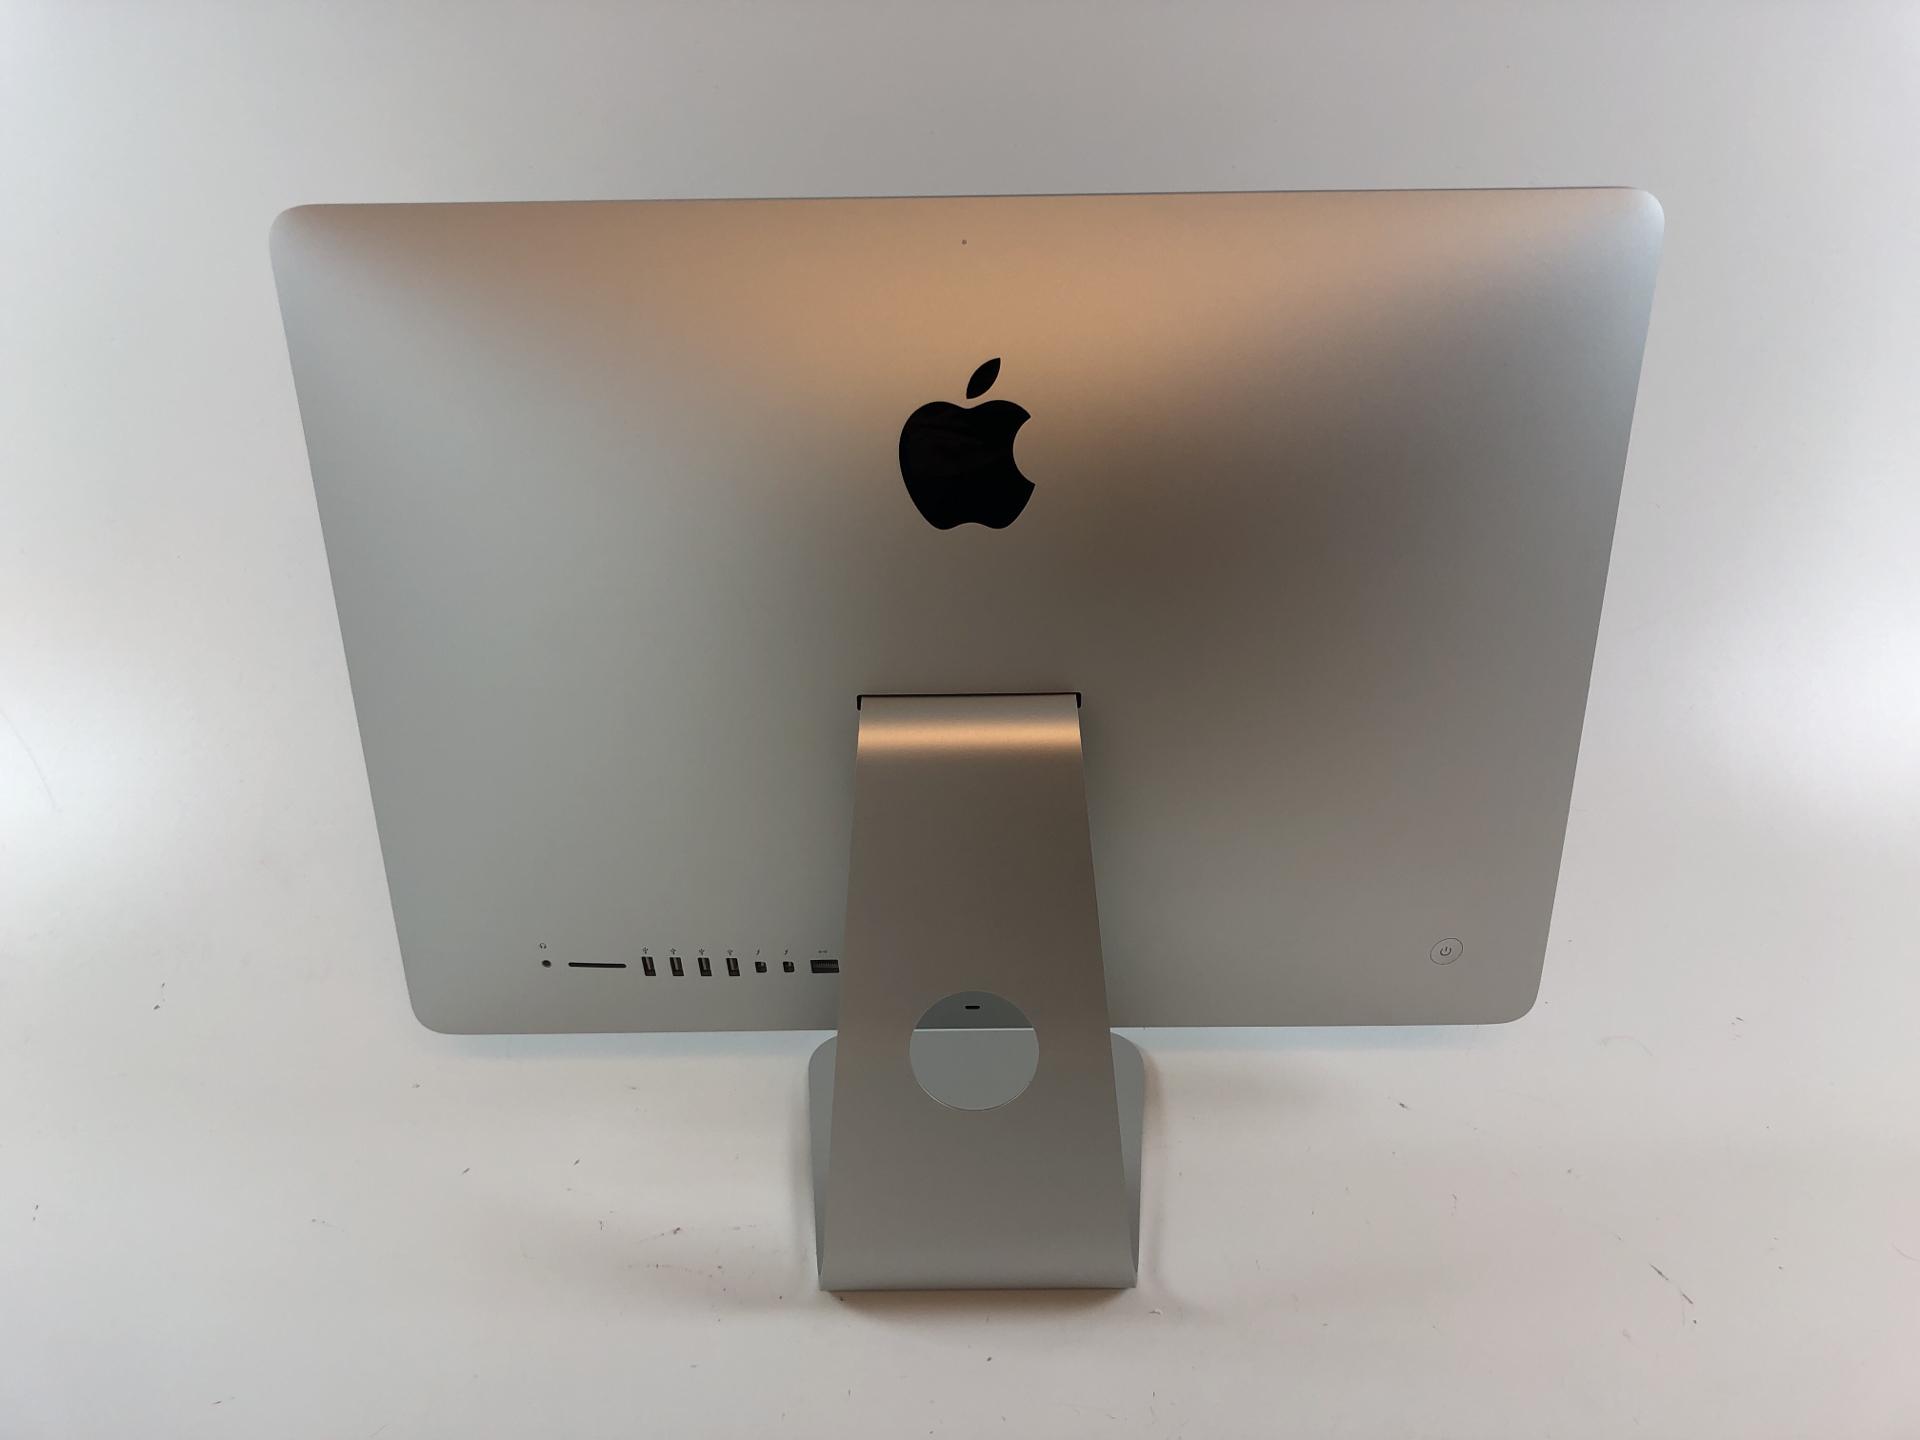 "iMac 21.5"" Late 2015 (Intel Quad-Core i5 2.8 GHz 8 GB RAM 1 TB HDD), Intel Quad-Core i5 2.8 GHz, 8 GB RAM, 1 TB HDD, Kuva 2"